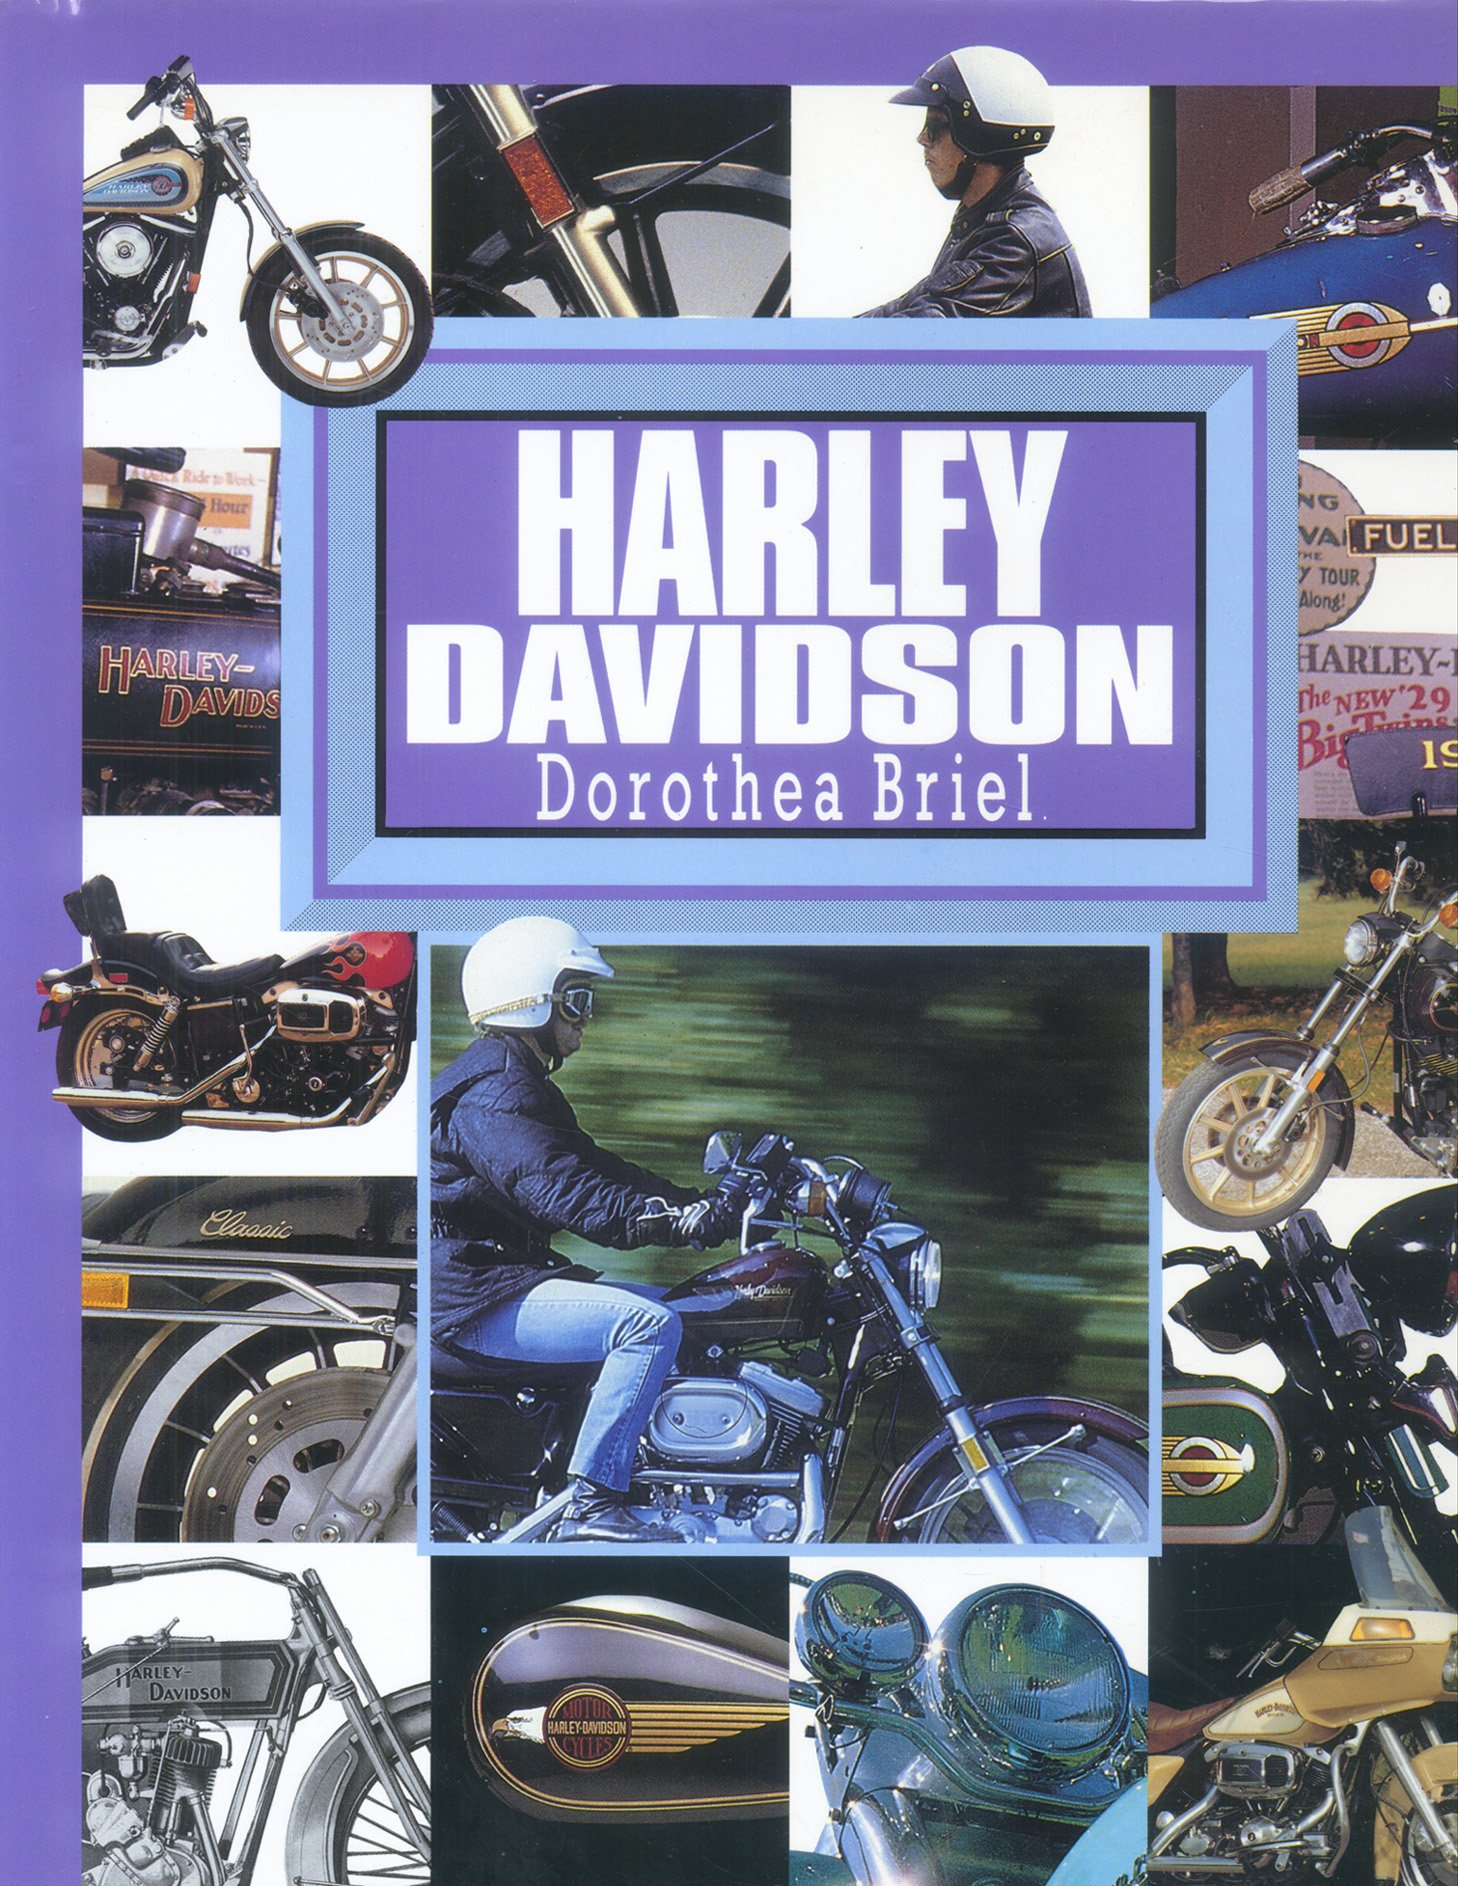 Harley Davidson, Dorothea Briel